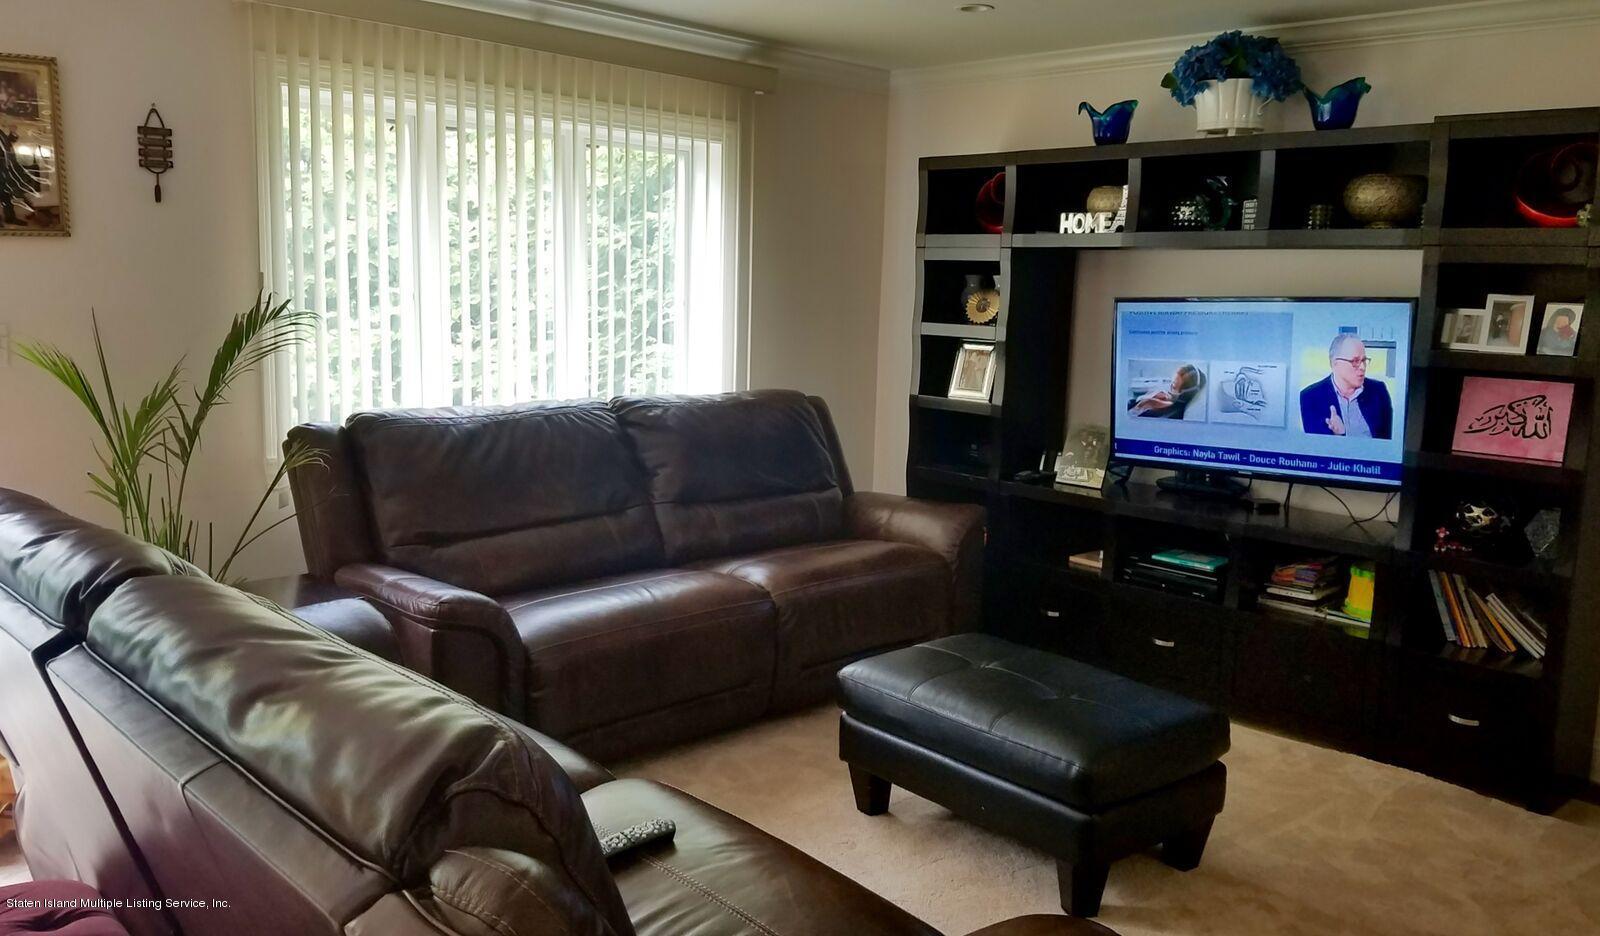 Single Family - Detached 104 Dutchess Ave   Staten Island, NY 10304, MLS-1113043-17